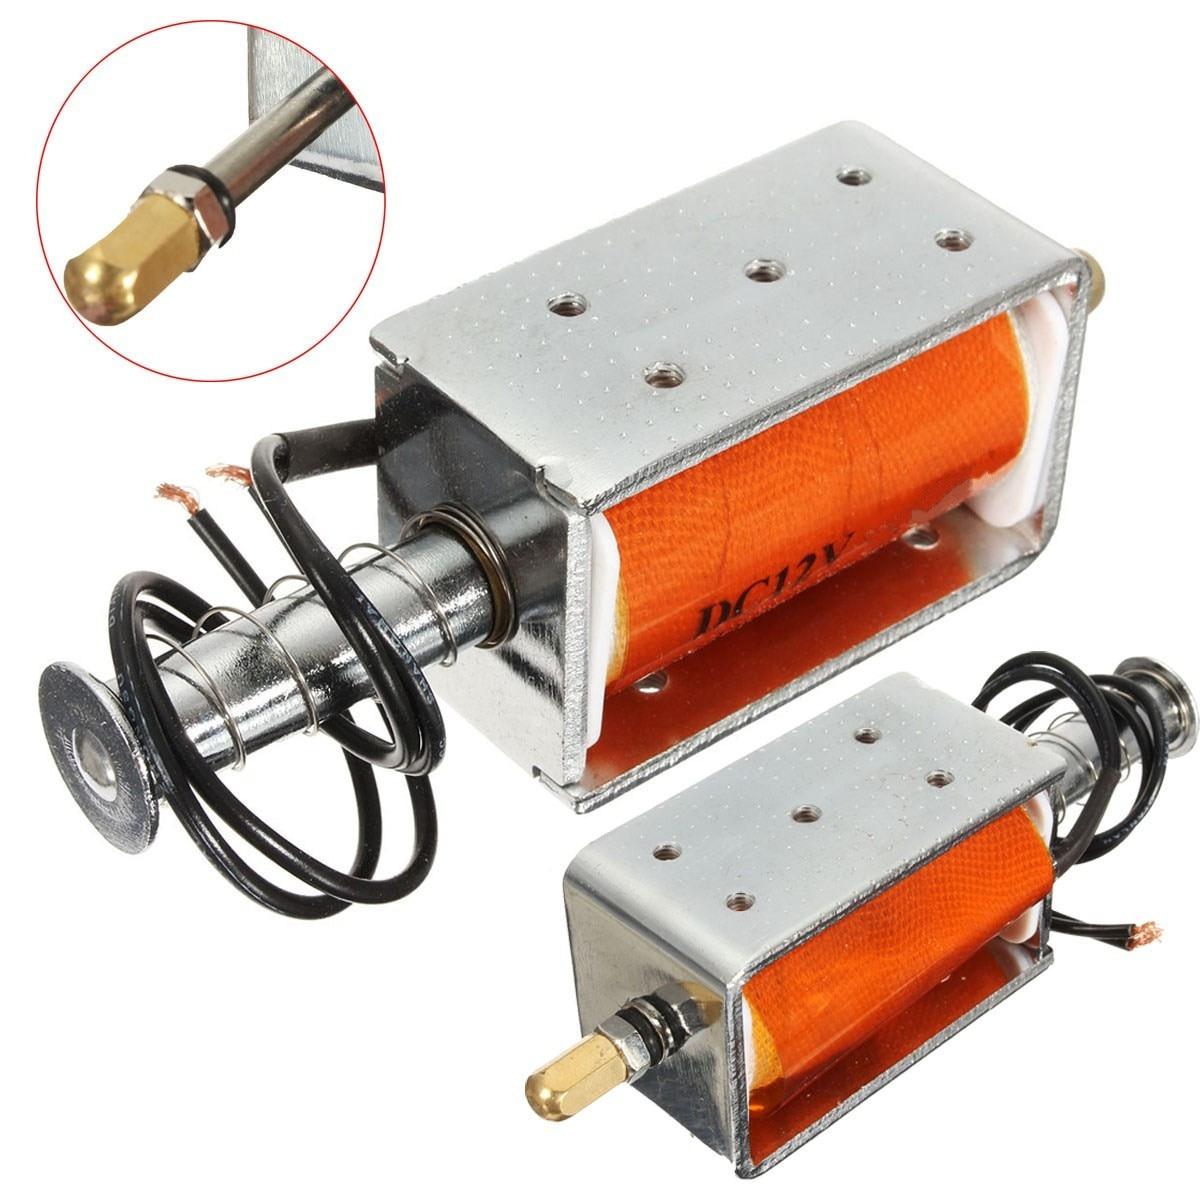 Novo elétrico 35mm longo-curso push-pull solenóide dc 12v pequeno ímã elétrico eletromagnético durável